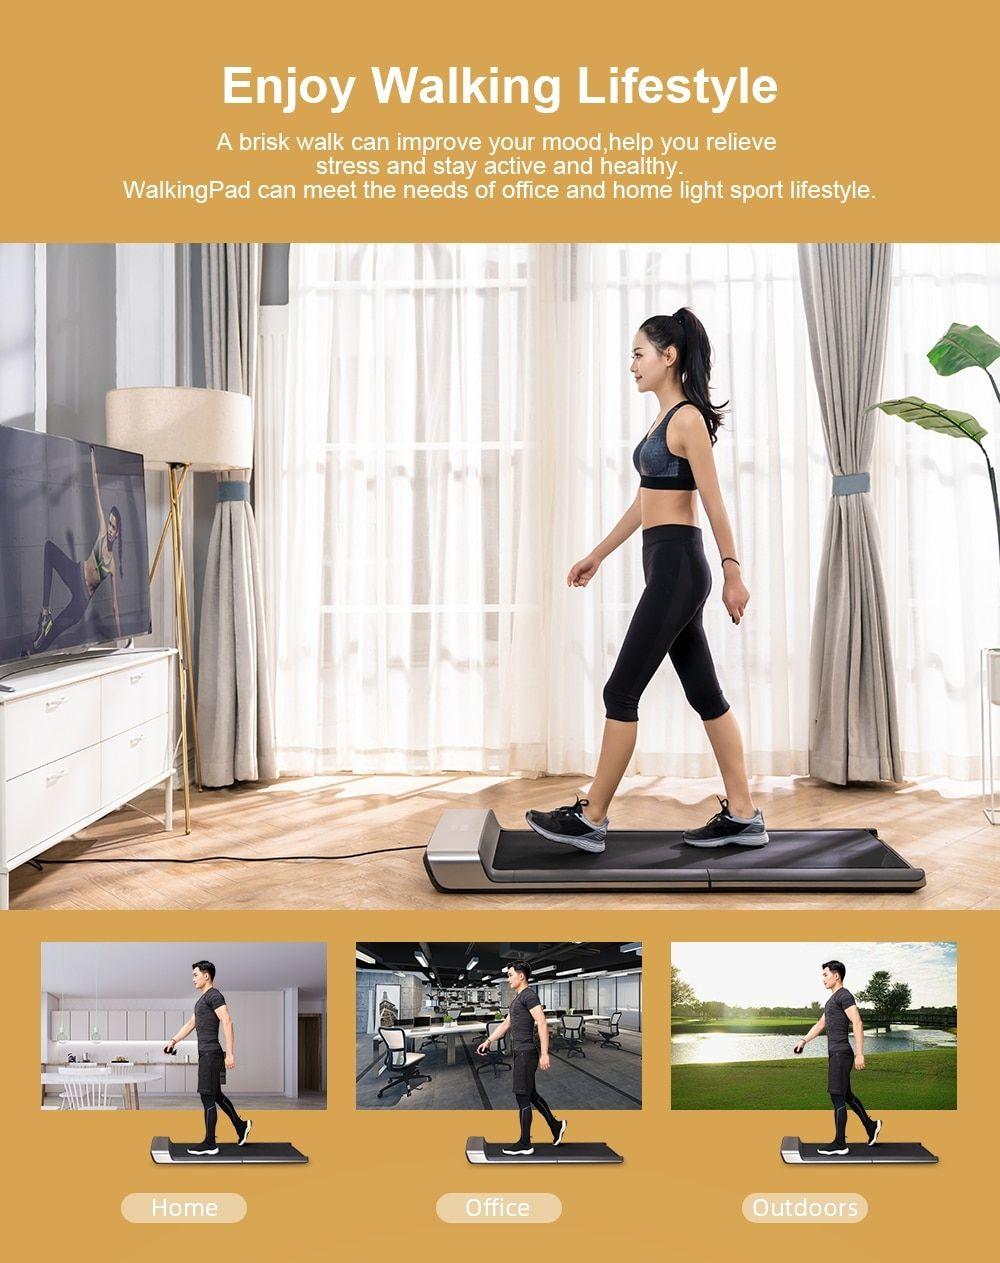 Portable WalkingPad A1 Smart Electric Foldable Treadmill